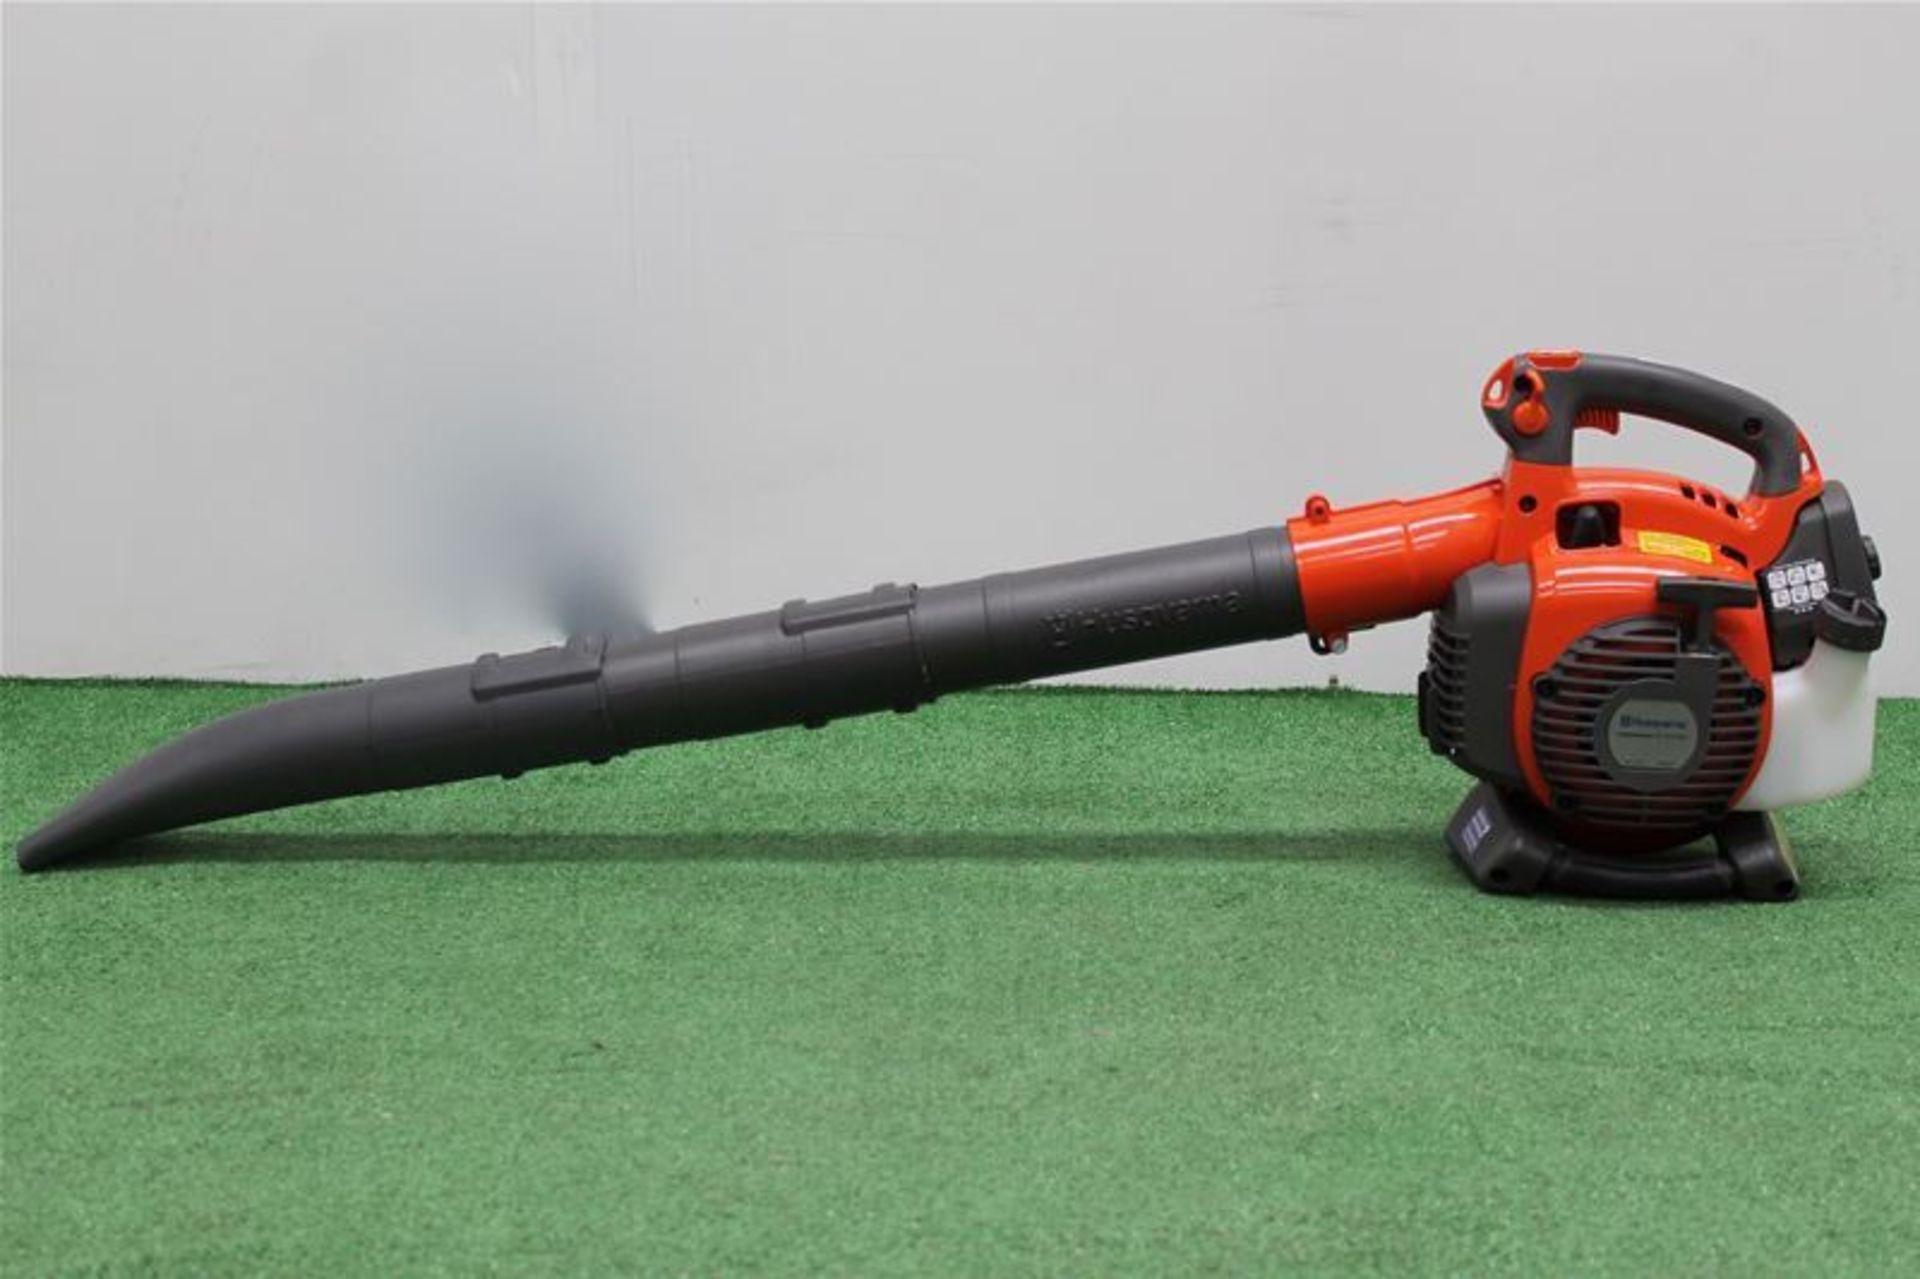 Husqvarna Petrol Blower/Vac 28cc - Image 3 of 3